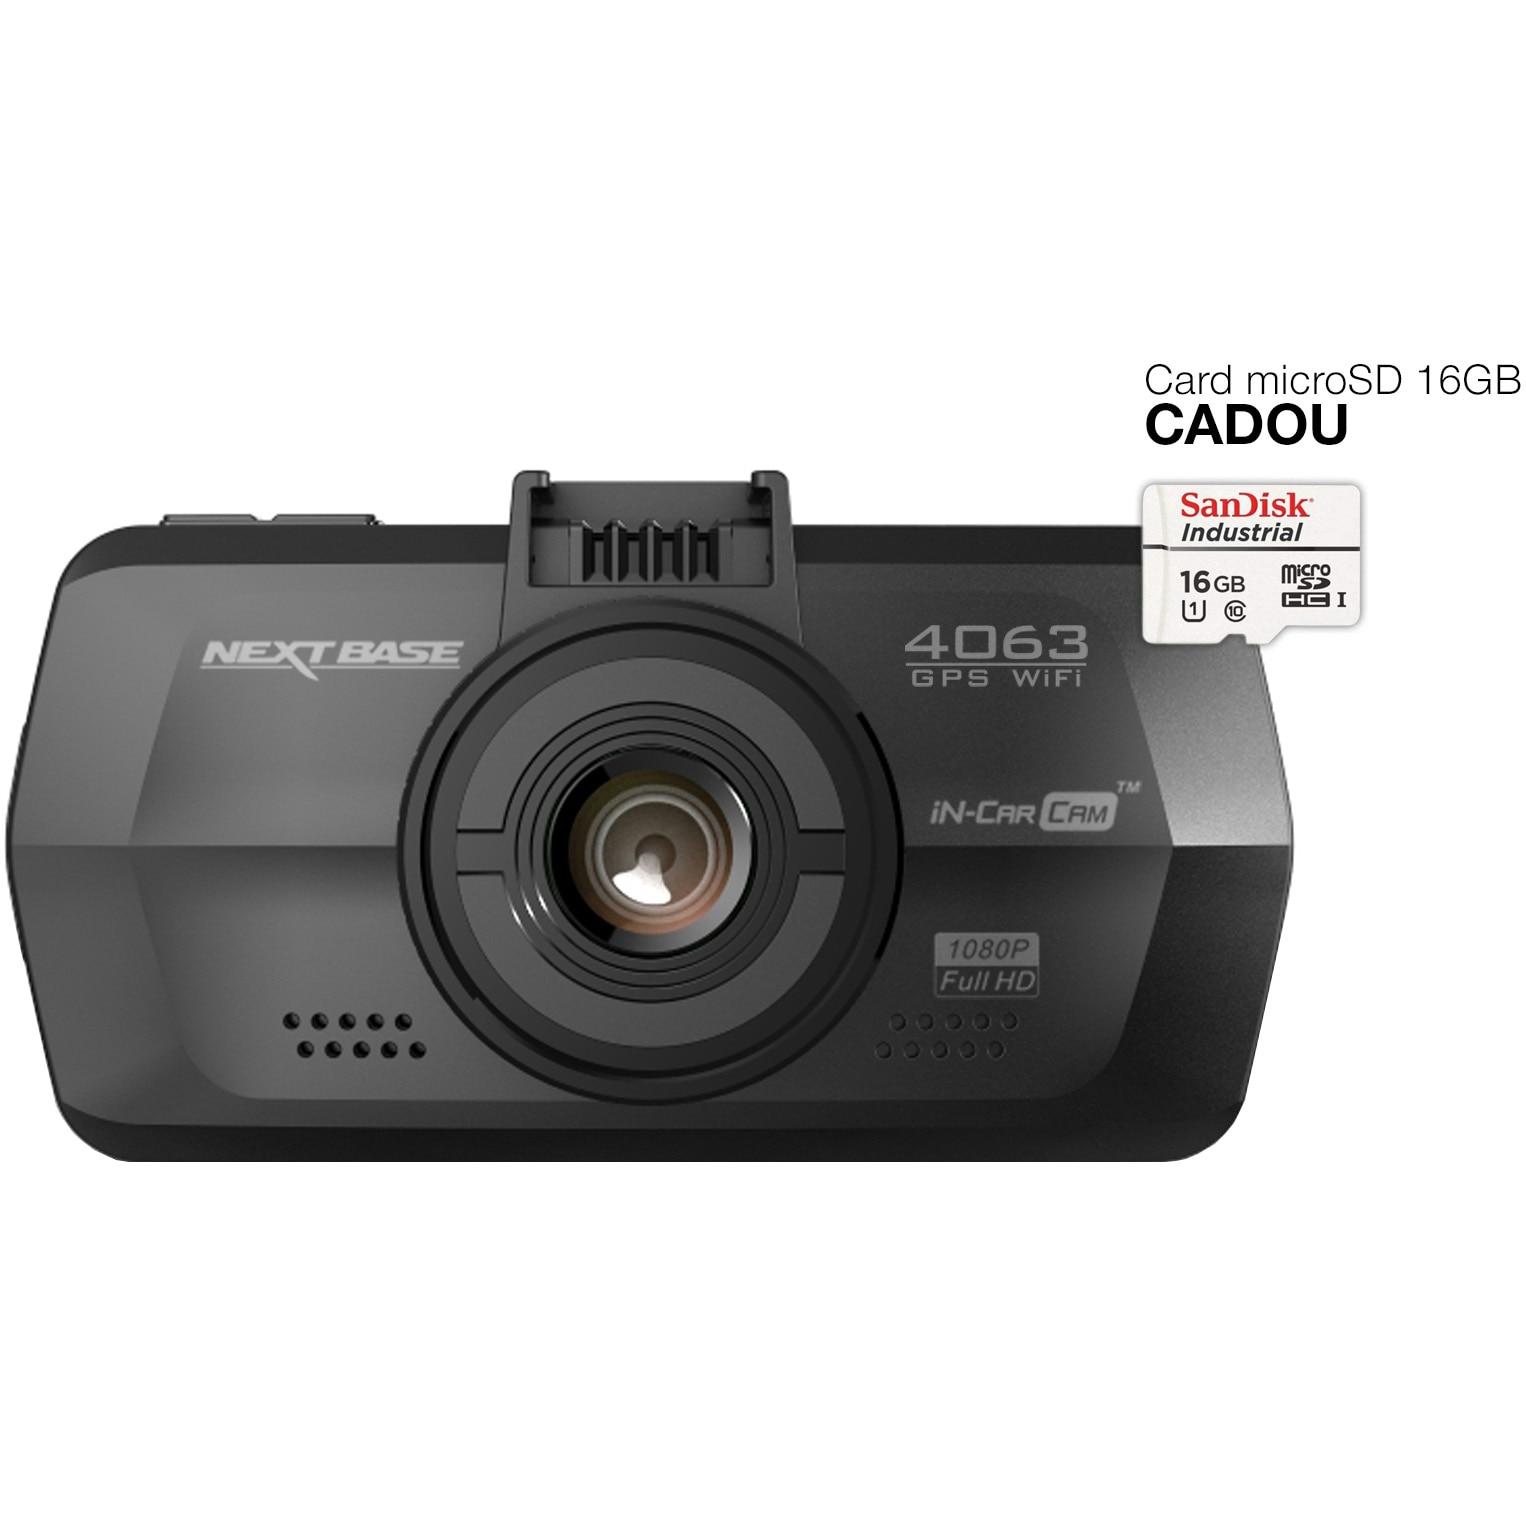 "Fotografie Camera auto DVR Next Base 4063, 2.7"", Full HD"